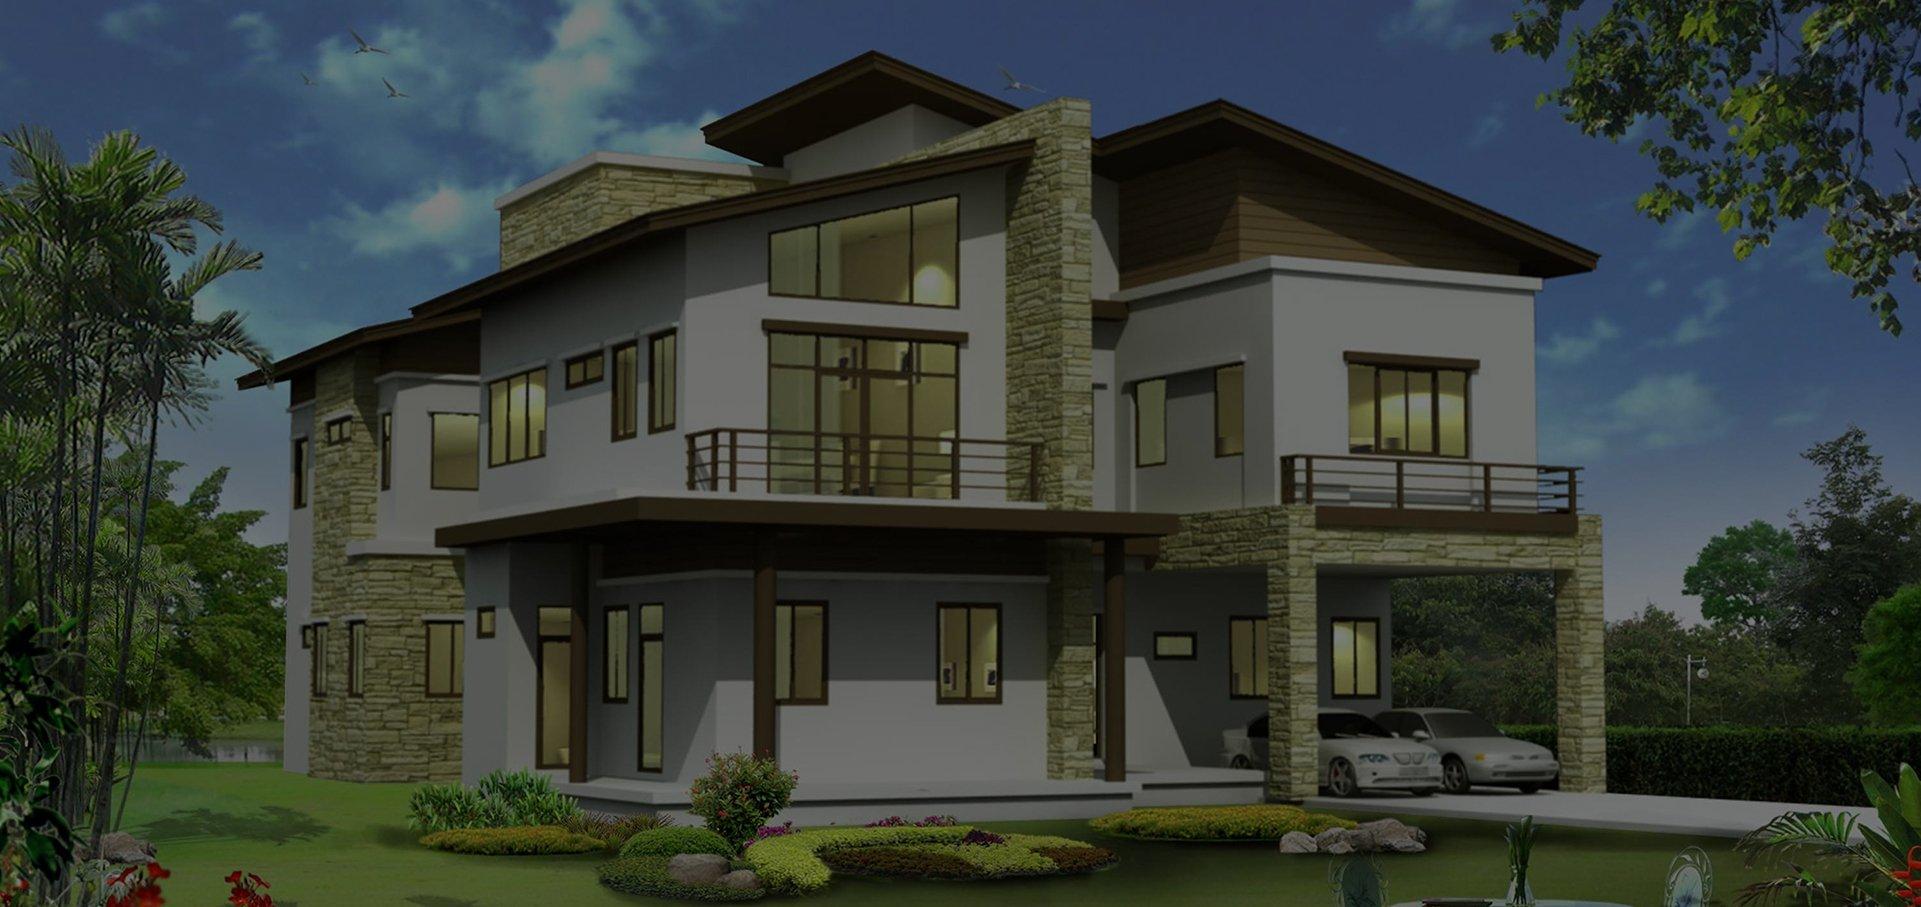 162 unique design Villas, Luxury Villas For Sale, Villas Images